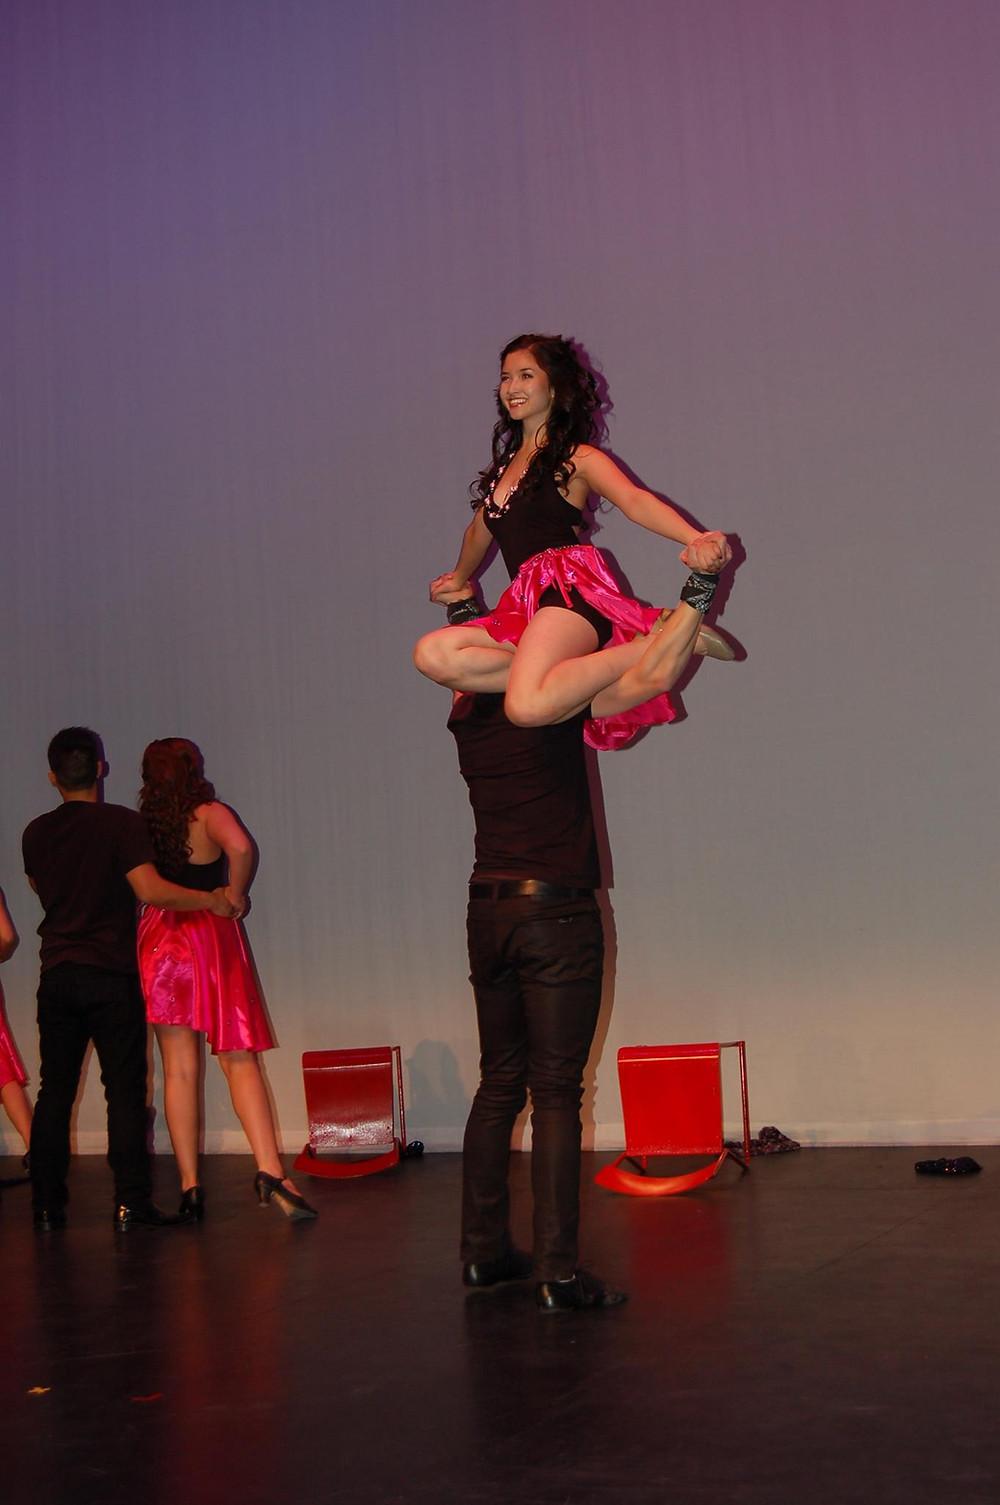 Cynthia as dancer